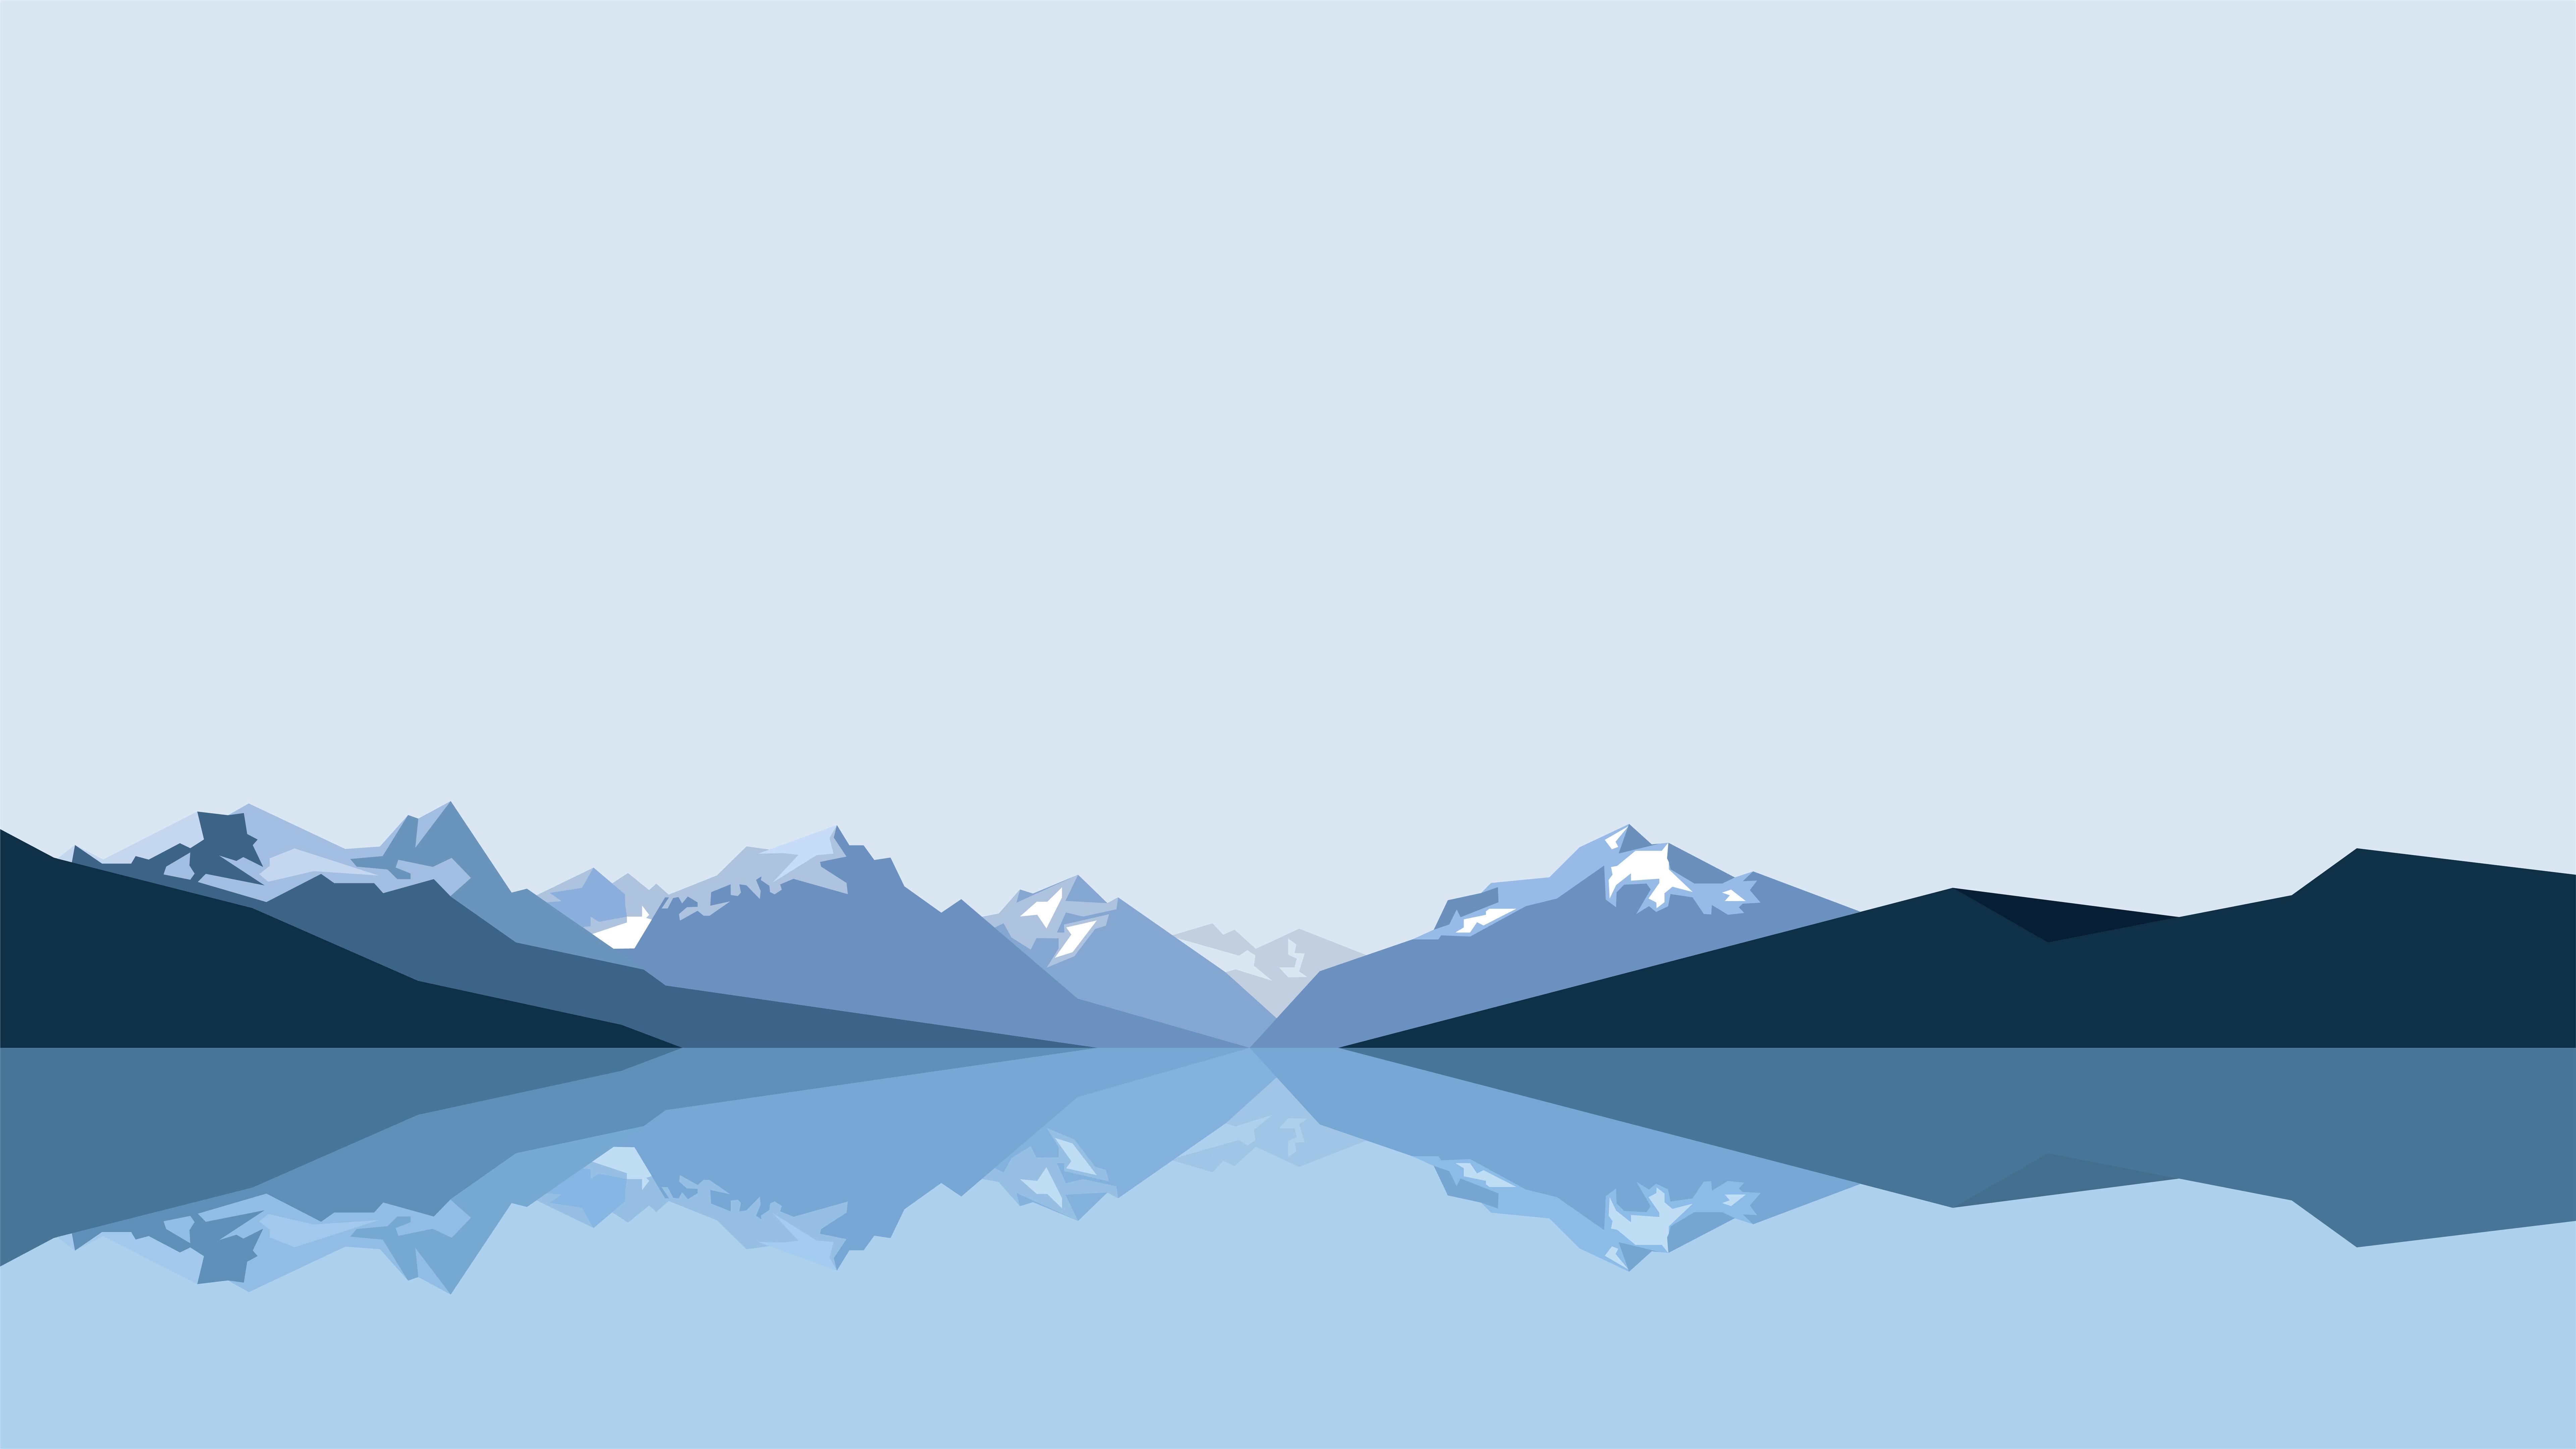 Great Wallpaper Mountain Minimalistic - minimalist-blue-mountains-8k-2x-7680x4320  Gallery_518186.jpg